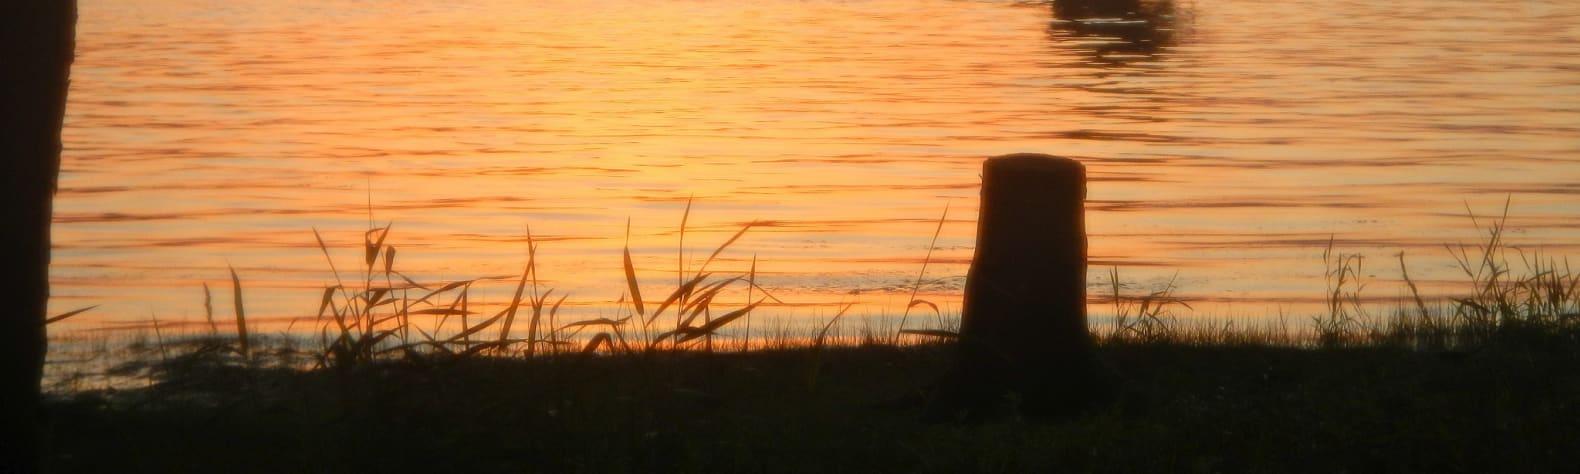 Goose Island Park